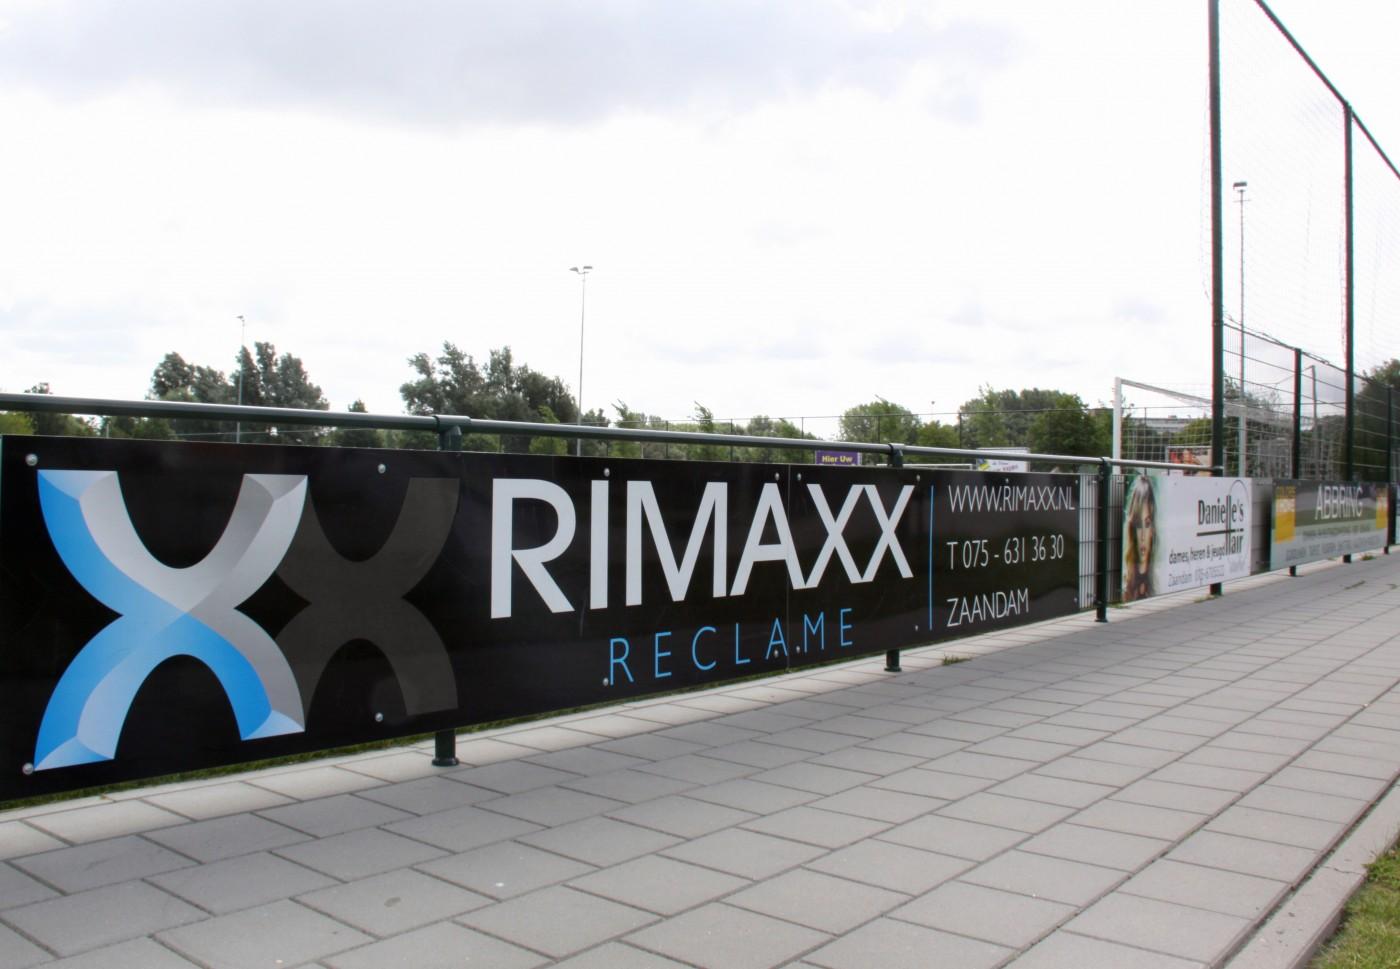 Sponsorbord Rimaxx